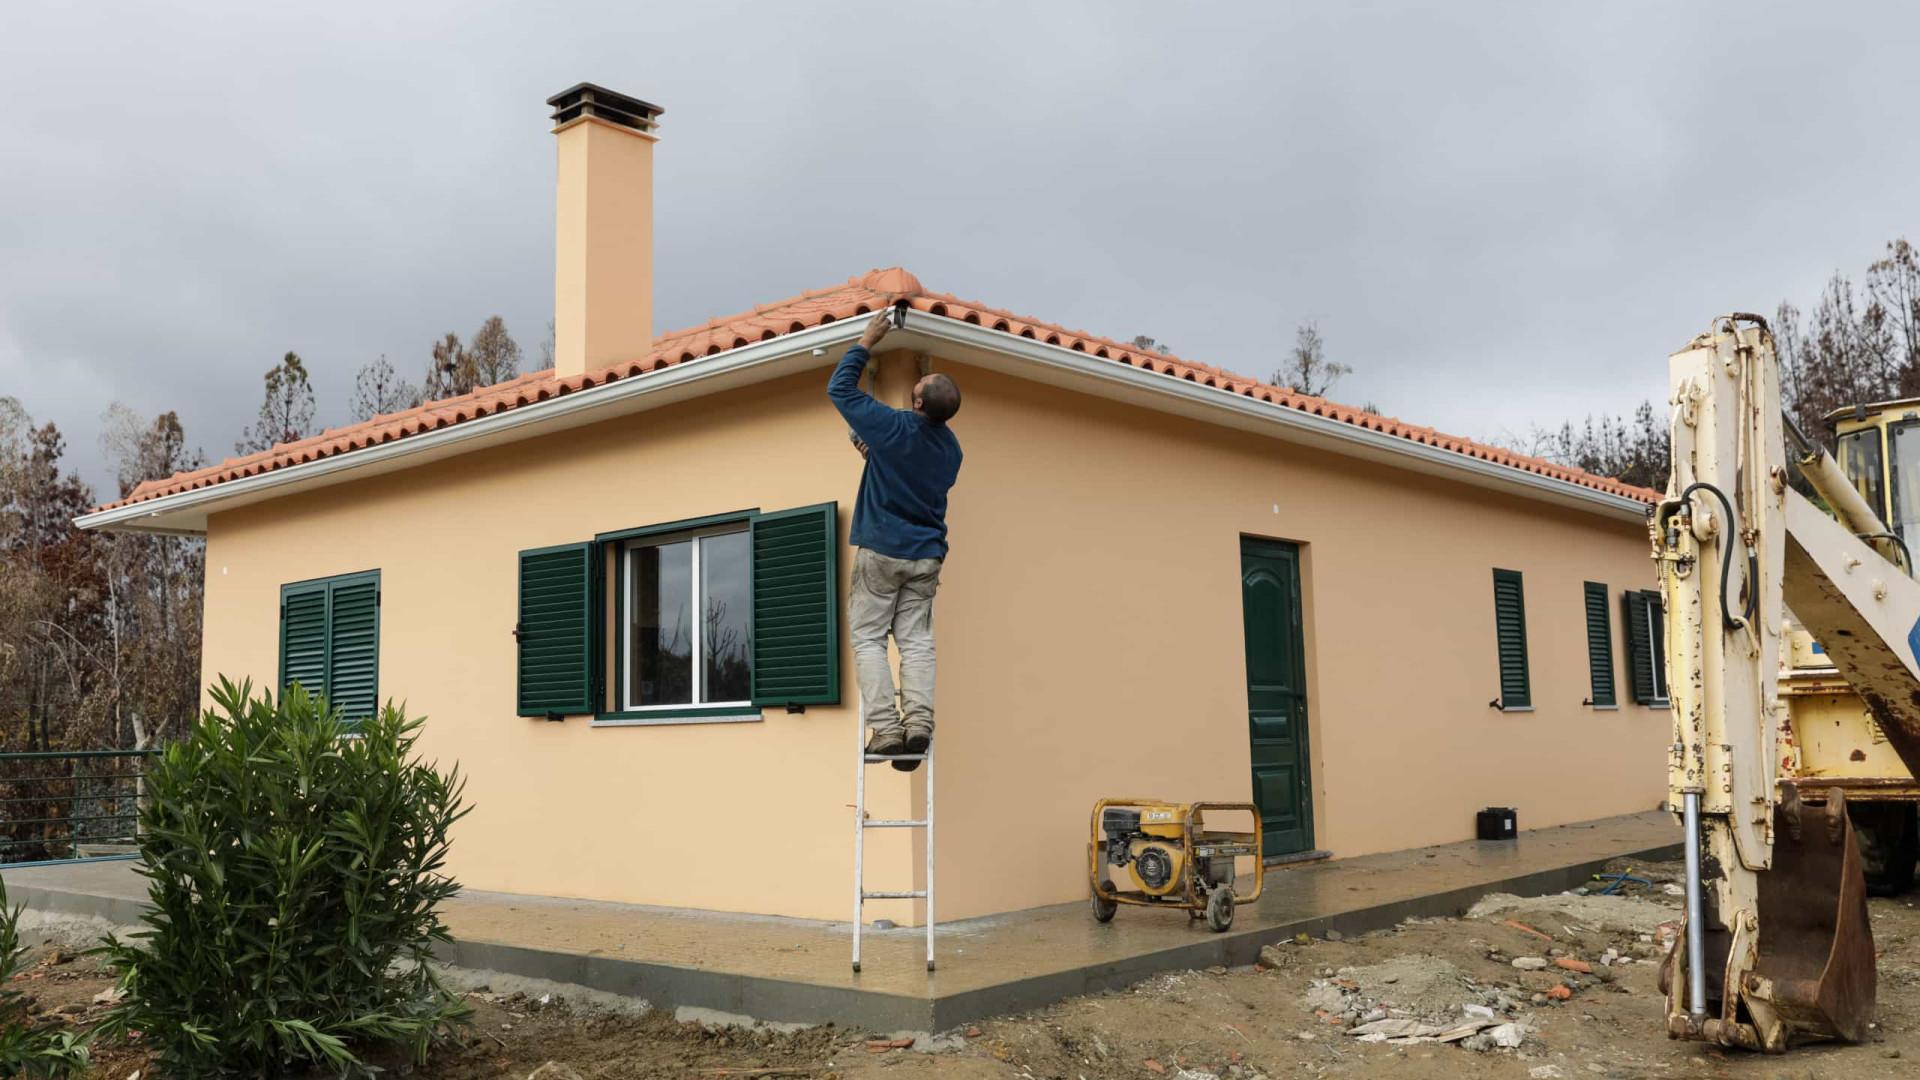 Concluídas 149 das 265 casas a reabilitar através do Fundo Revita